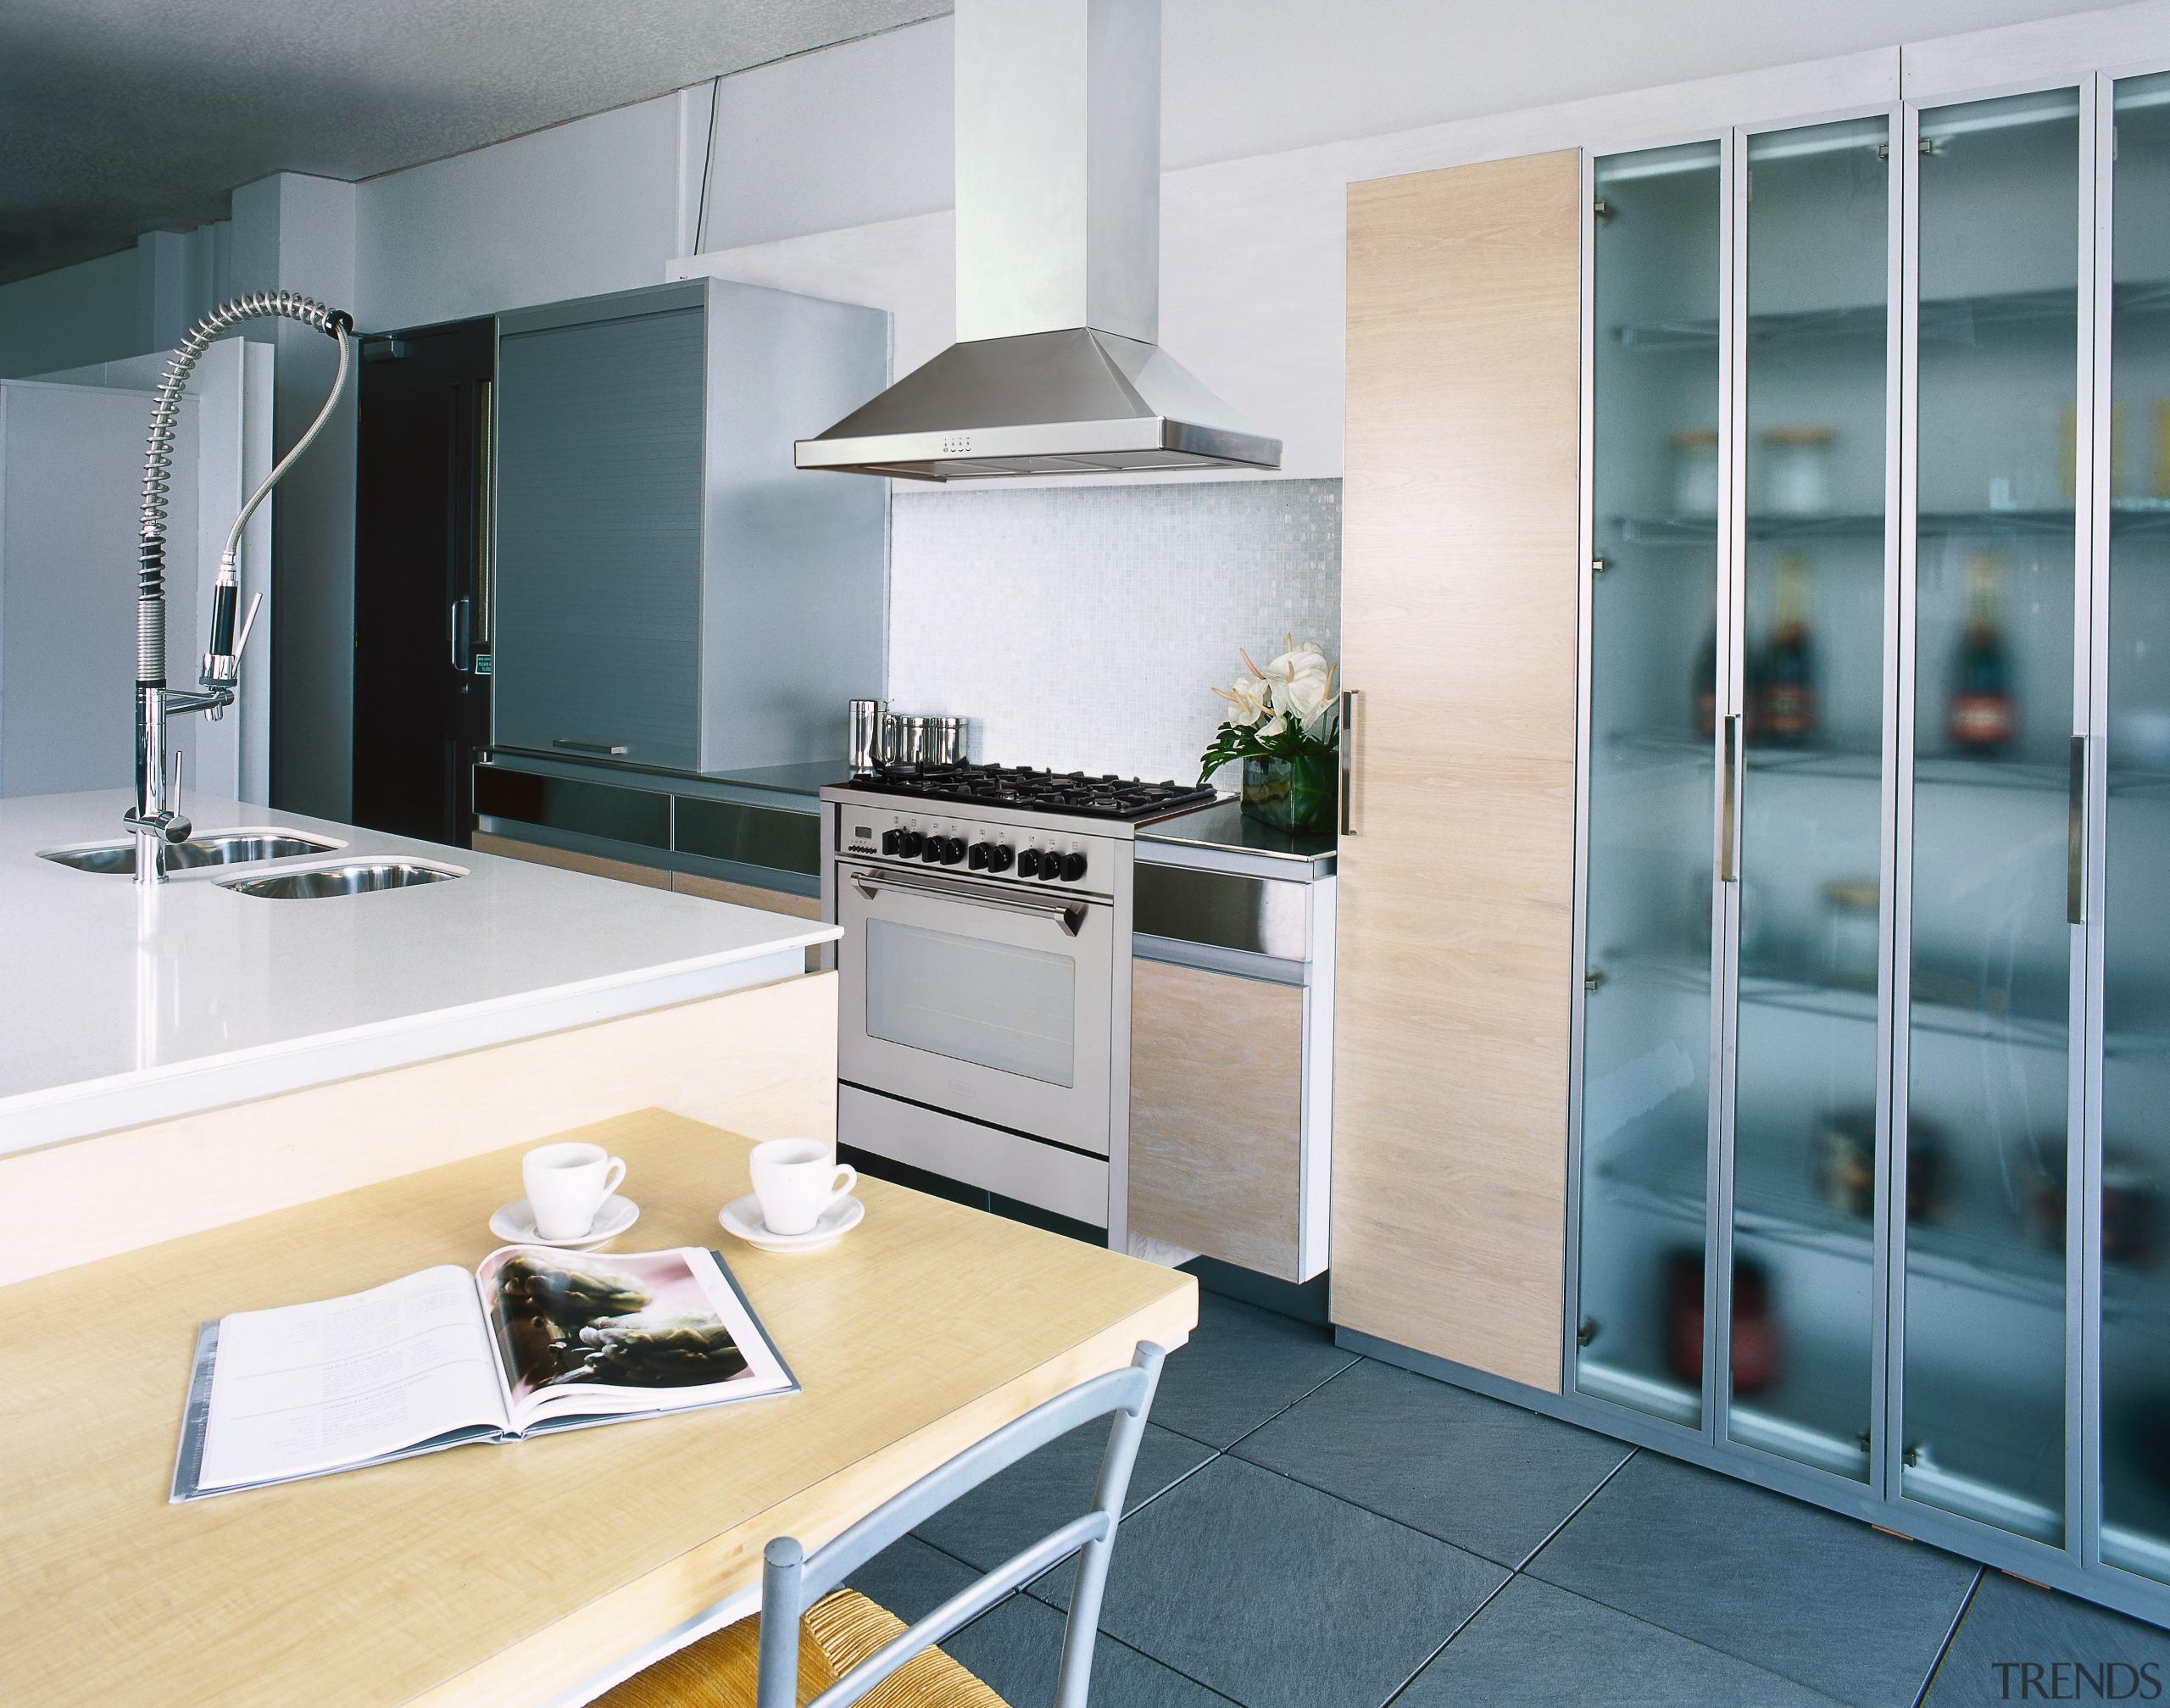 view of the kitchen area and delonghi kitchen countertop, cuisine classique, home appliance, interior design, kitchen, room, white